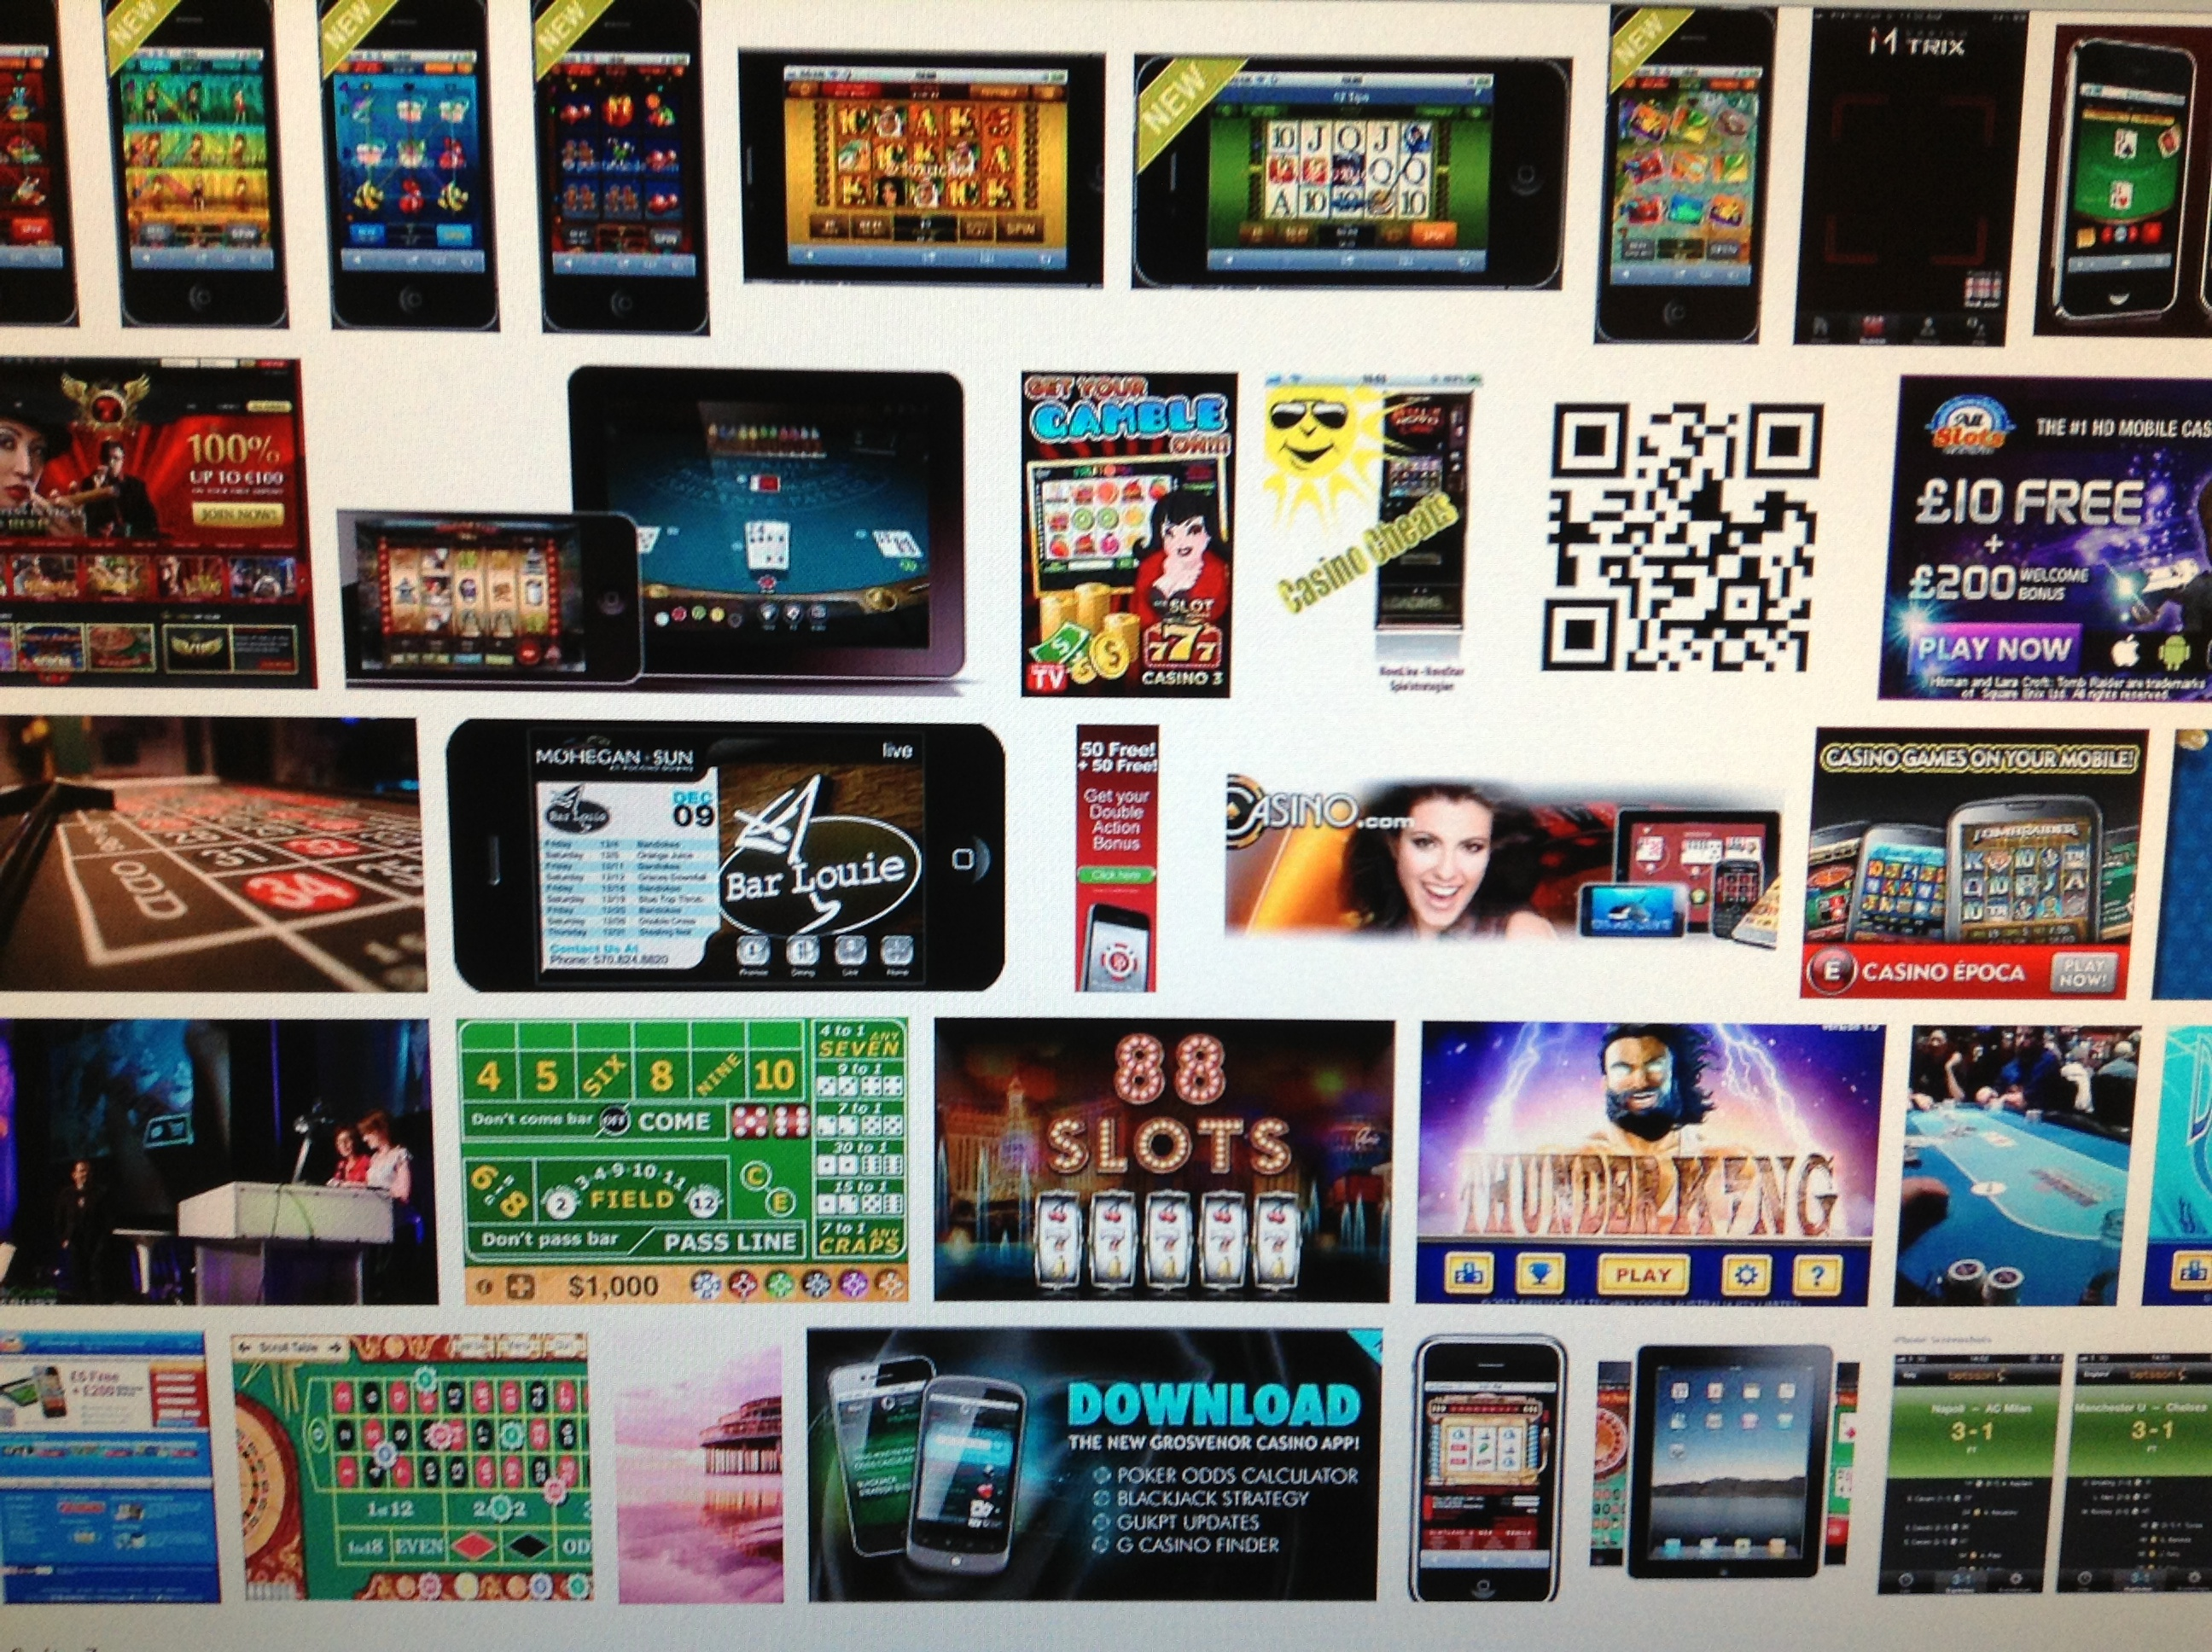 Austria online gambling